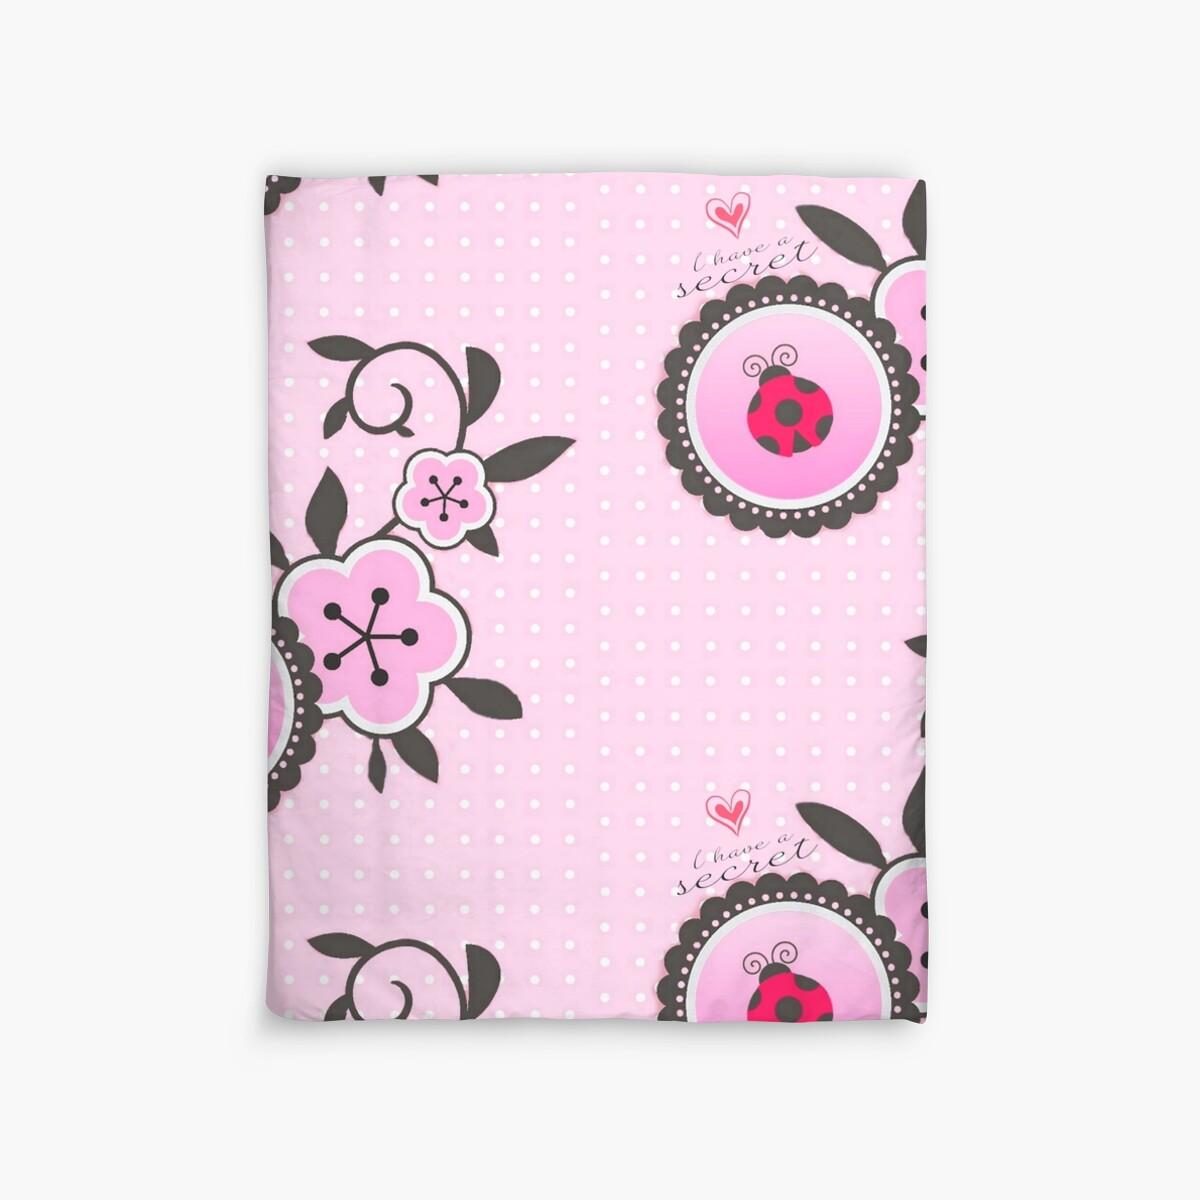 Quot Miraculous Ladybug Marinette Dupain Cheng Pink Polka